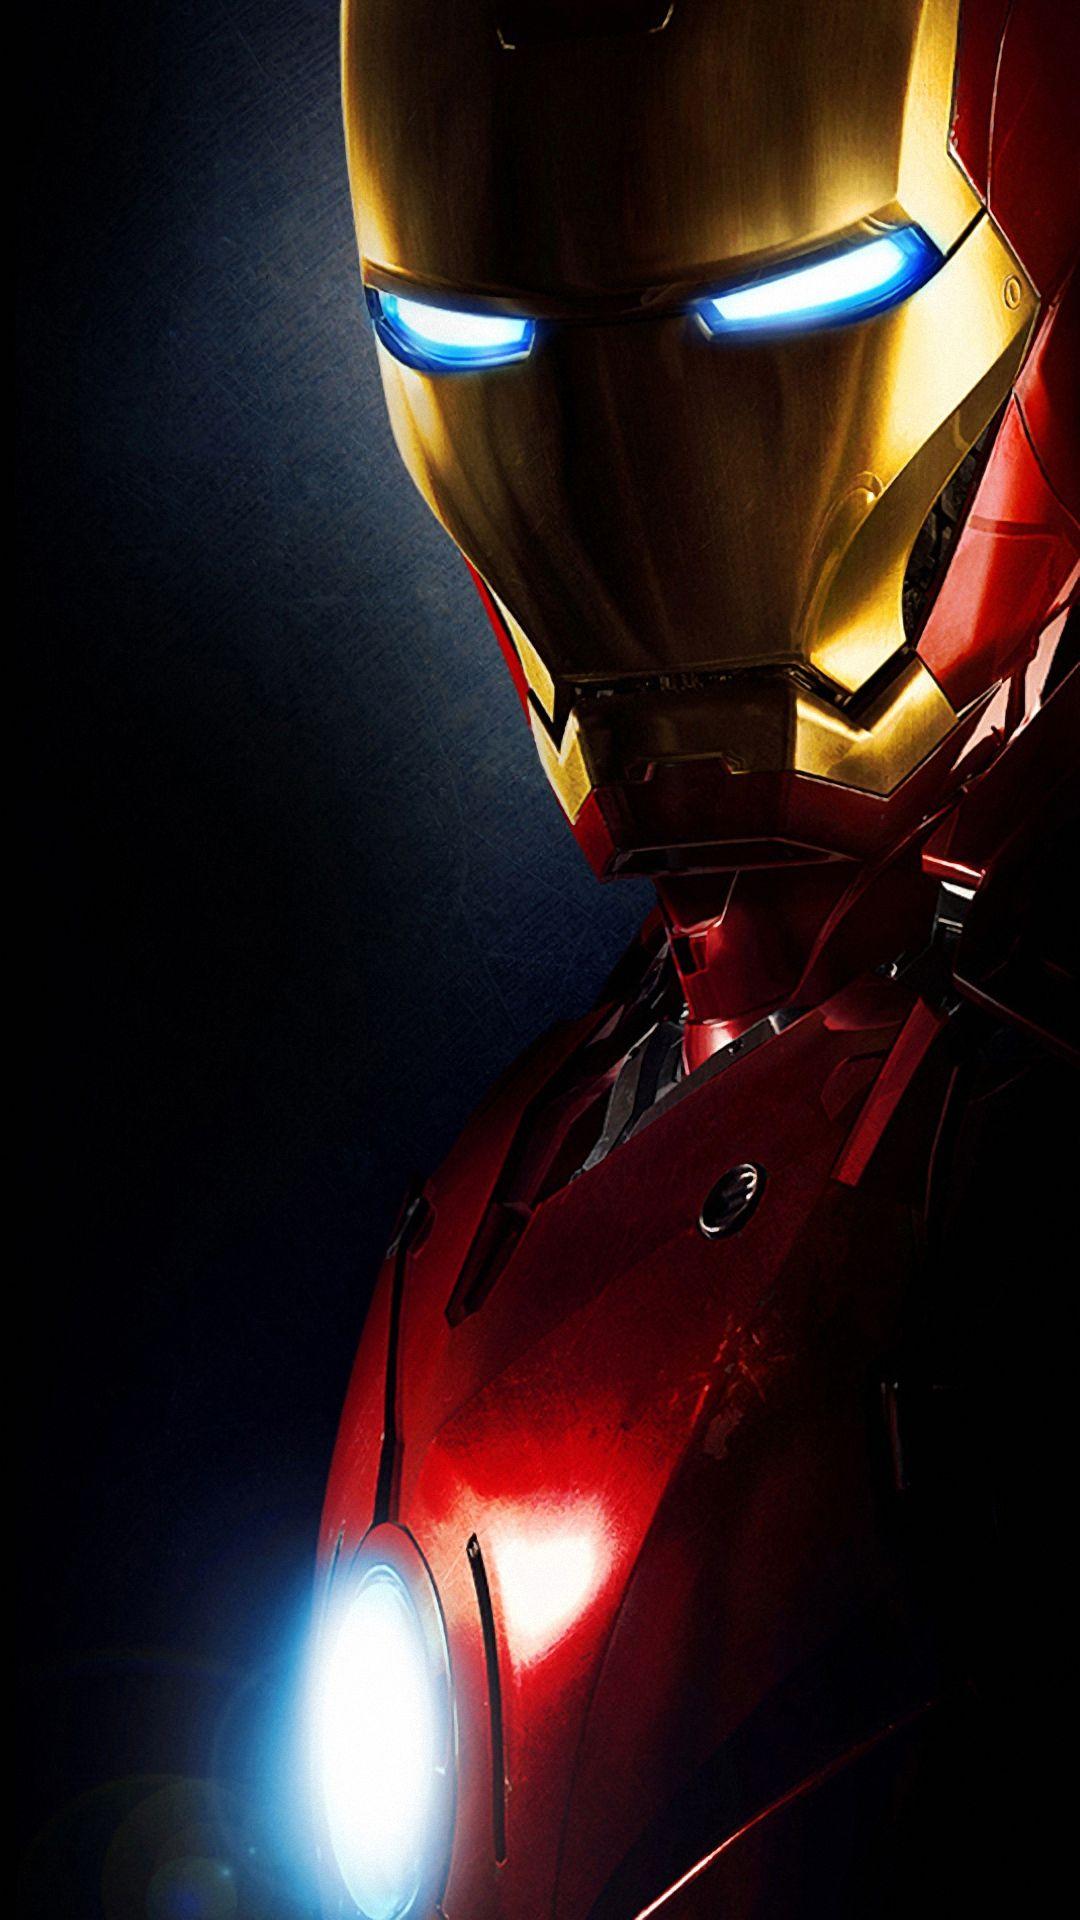 fantastic Iron Man Wallpapers